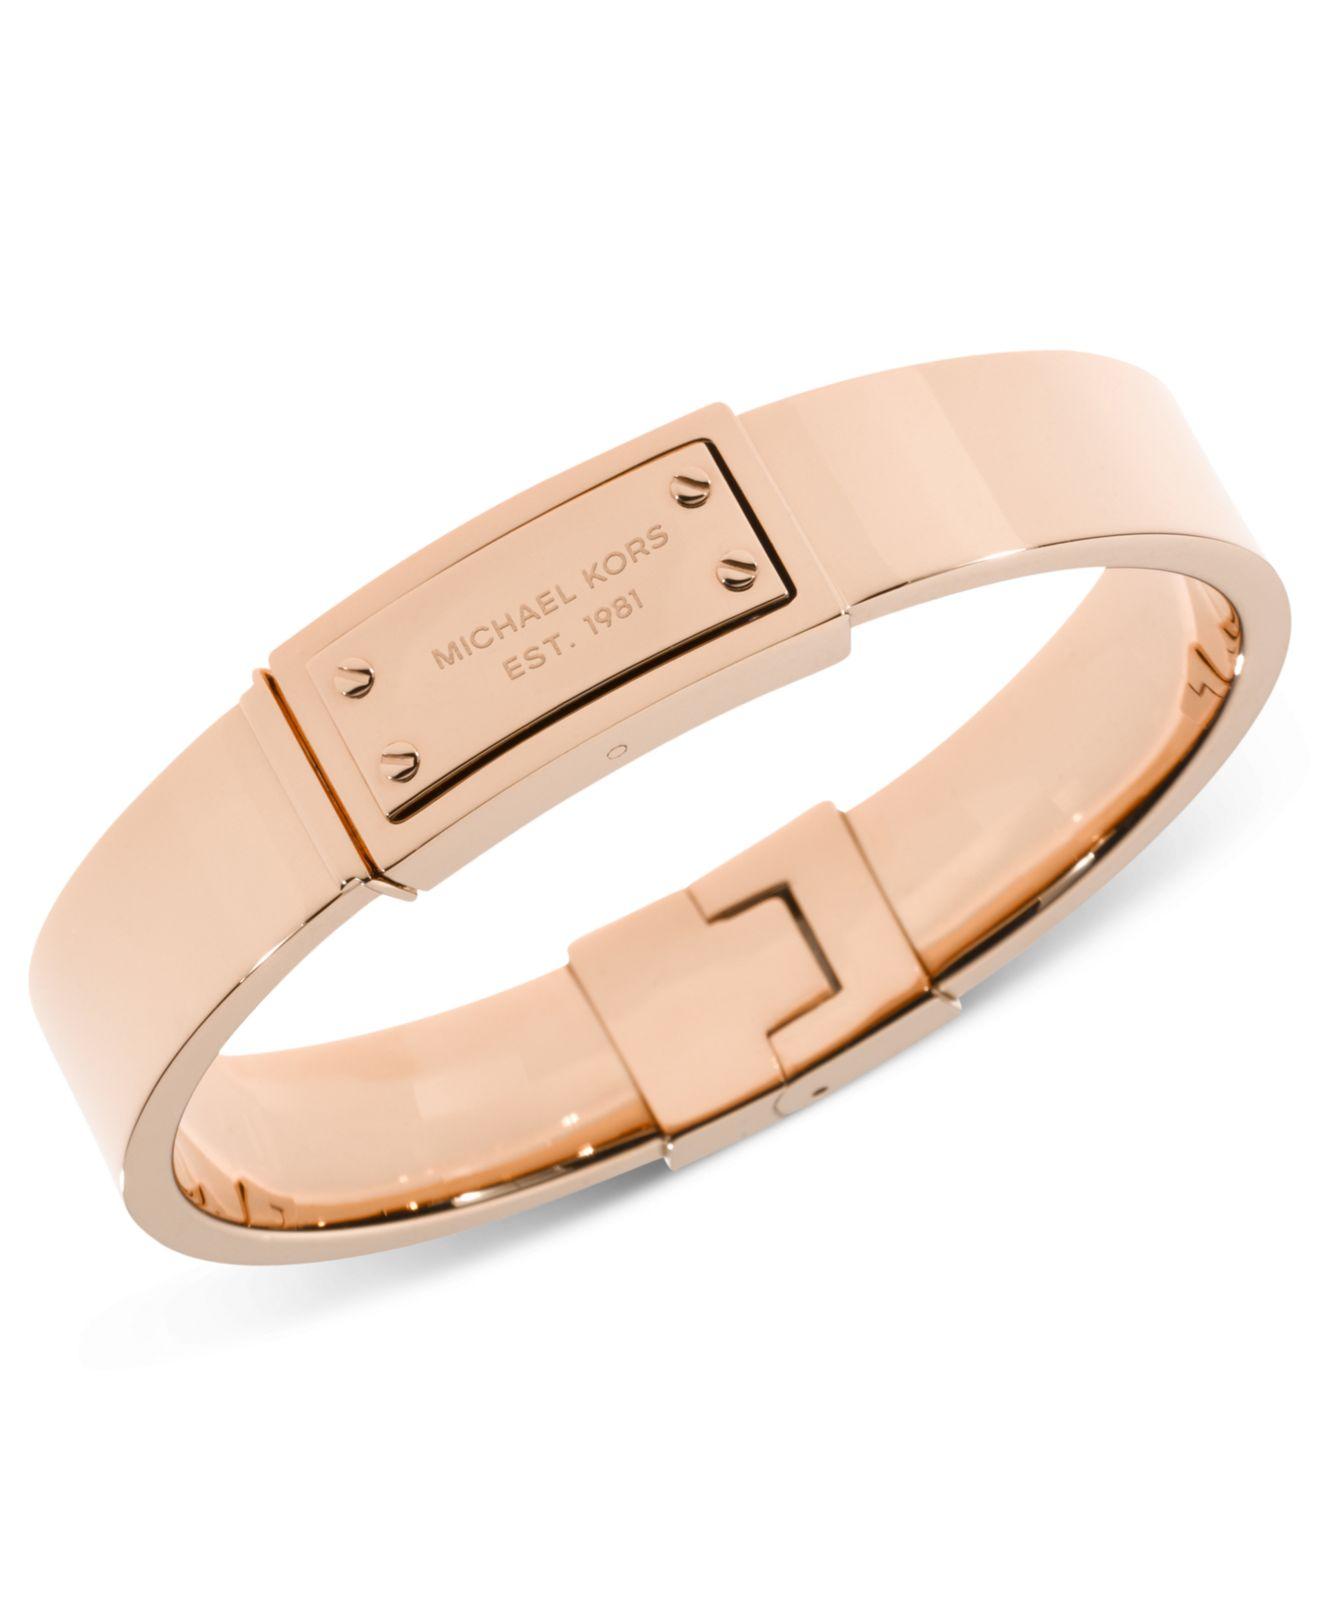 Michael Kors Rose Gold-Tone Logo Plaque Bangle Bracelet in Gold  rose Rose Gold Bangle Bracelet